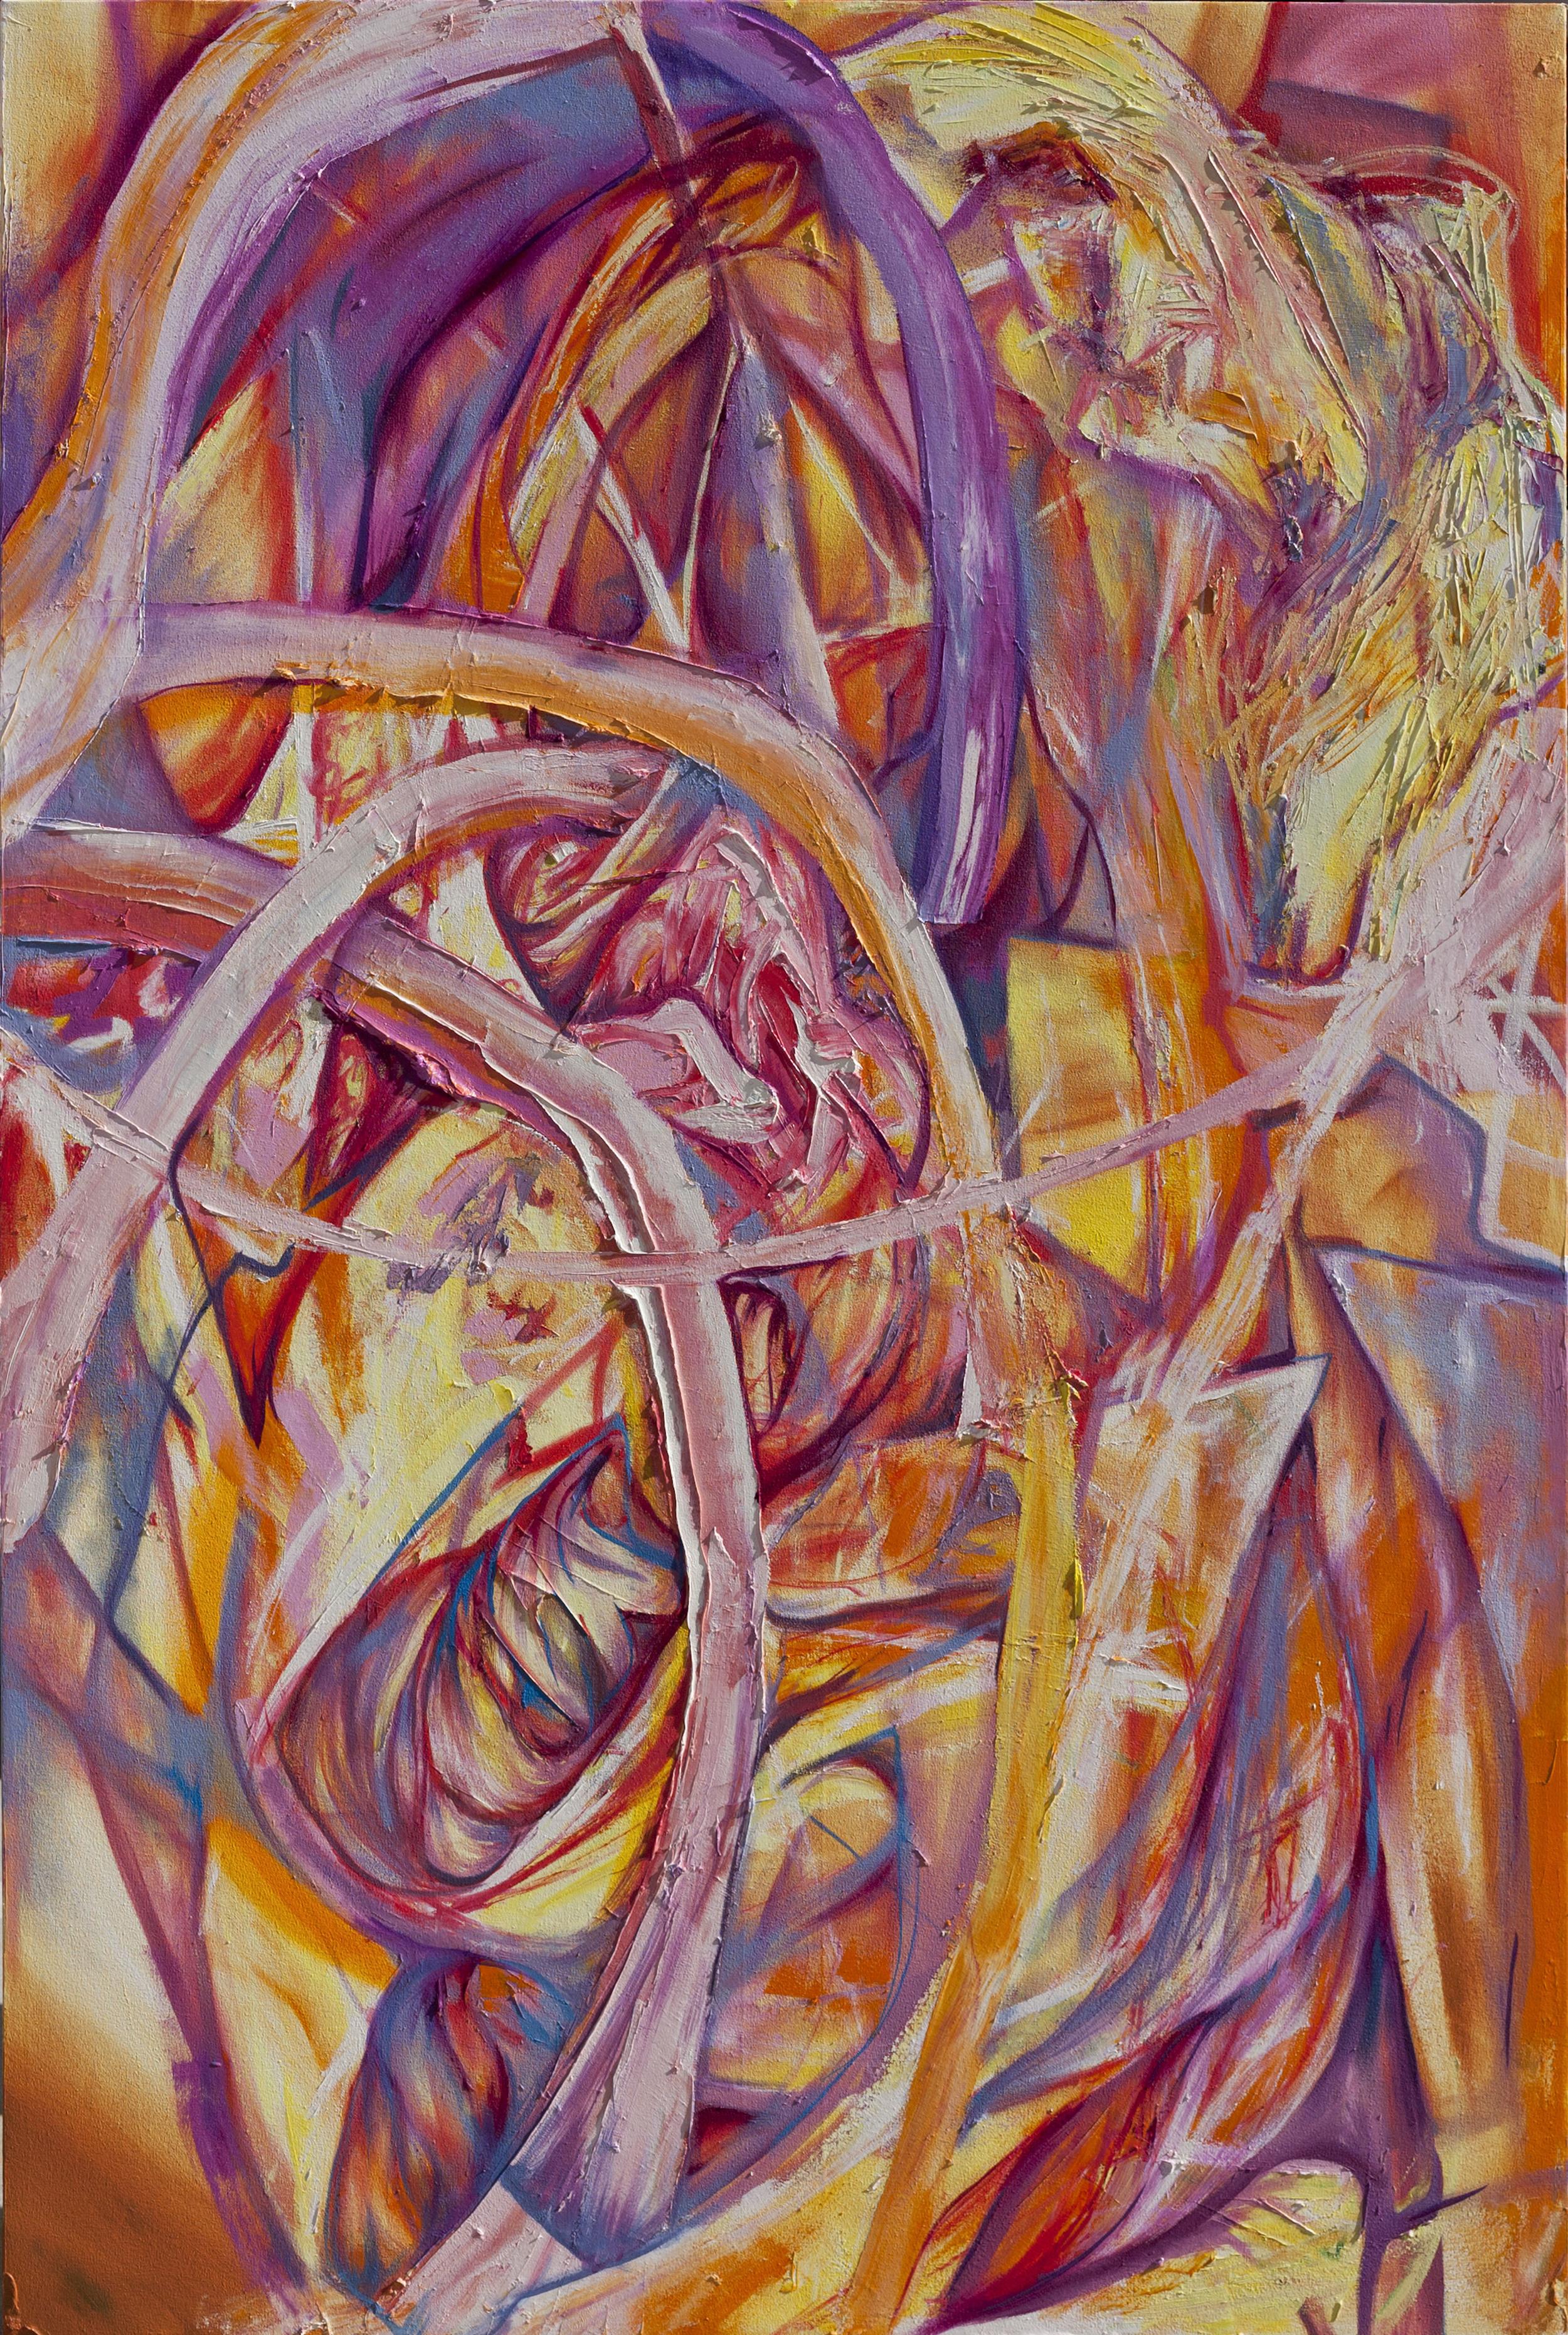 "Domestic Spark, 72"" x 48"", Oil on Canvas, 2015"